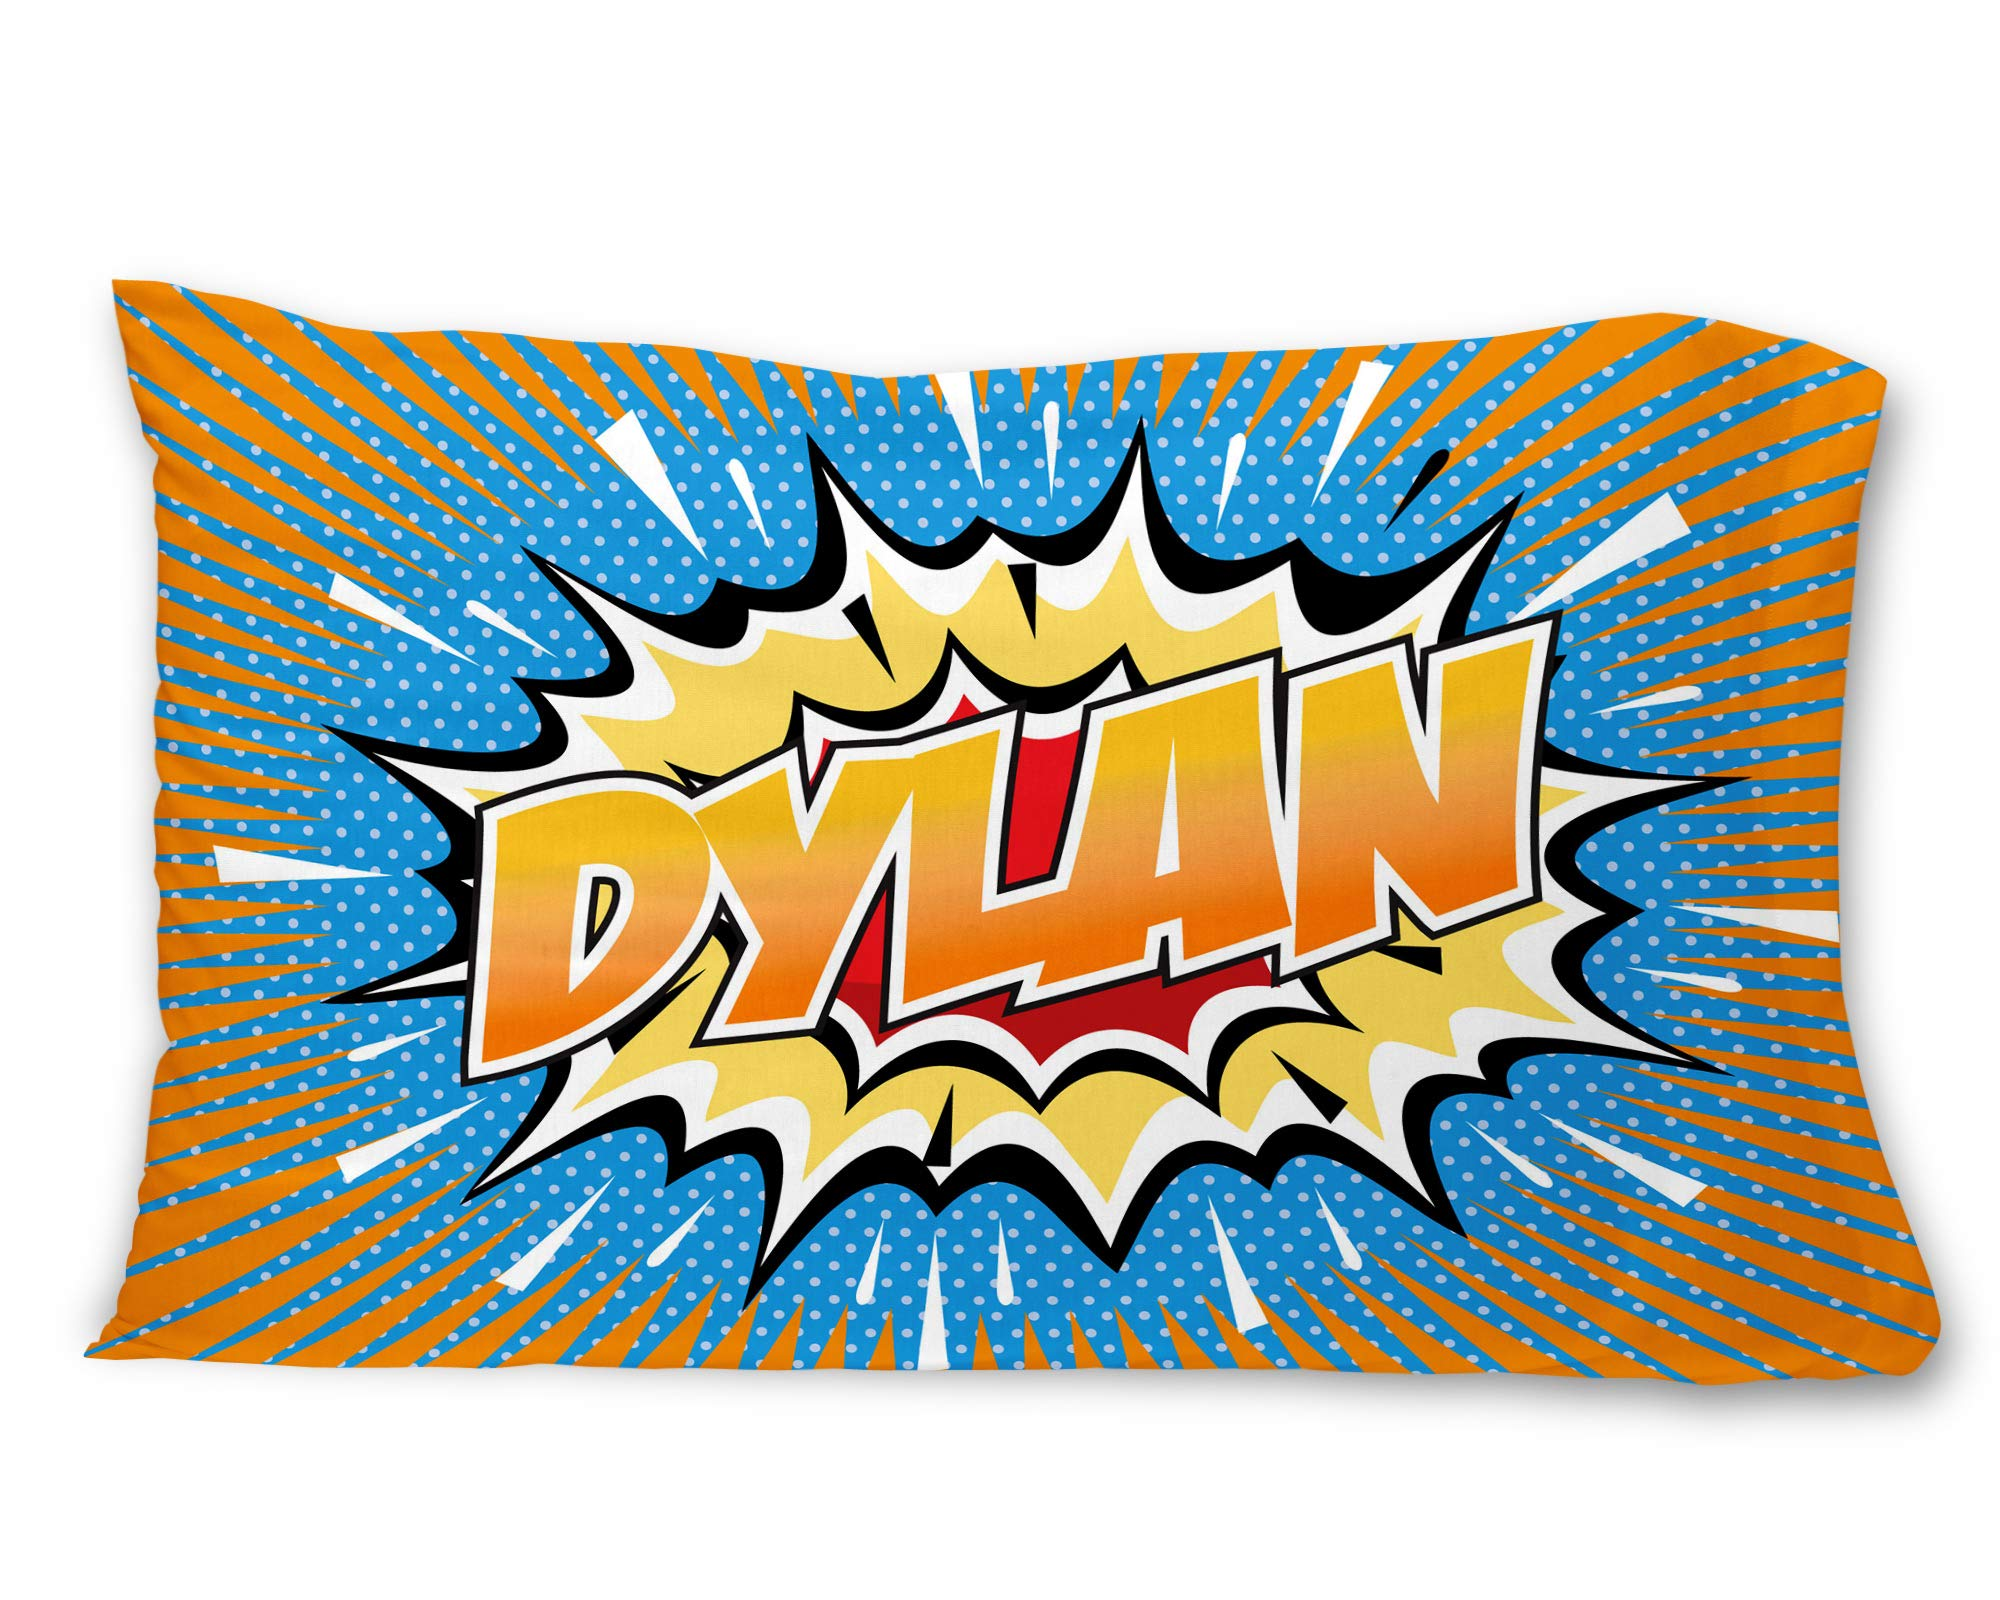 BadBananas Comic Book Style - Kids Custom, Personalized (Customized) Microfiber Pillowcase Gift for Boys (Pillow Cover, Sham) by Bad Bananas